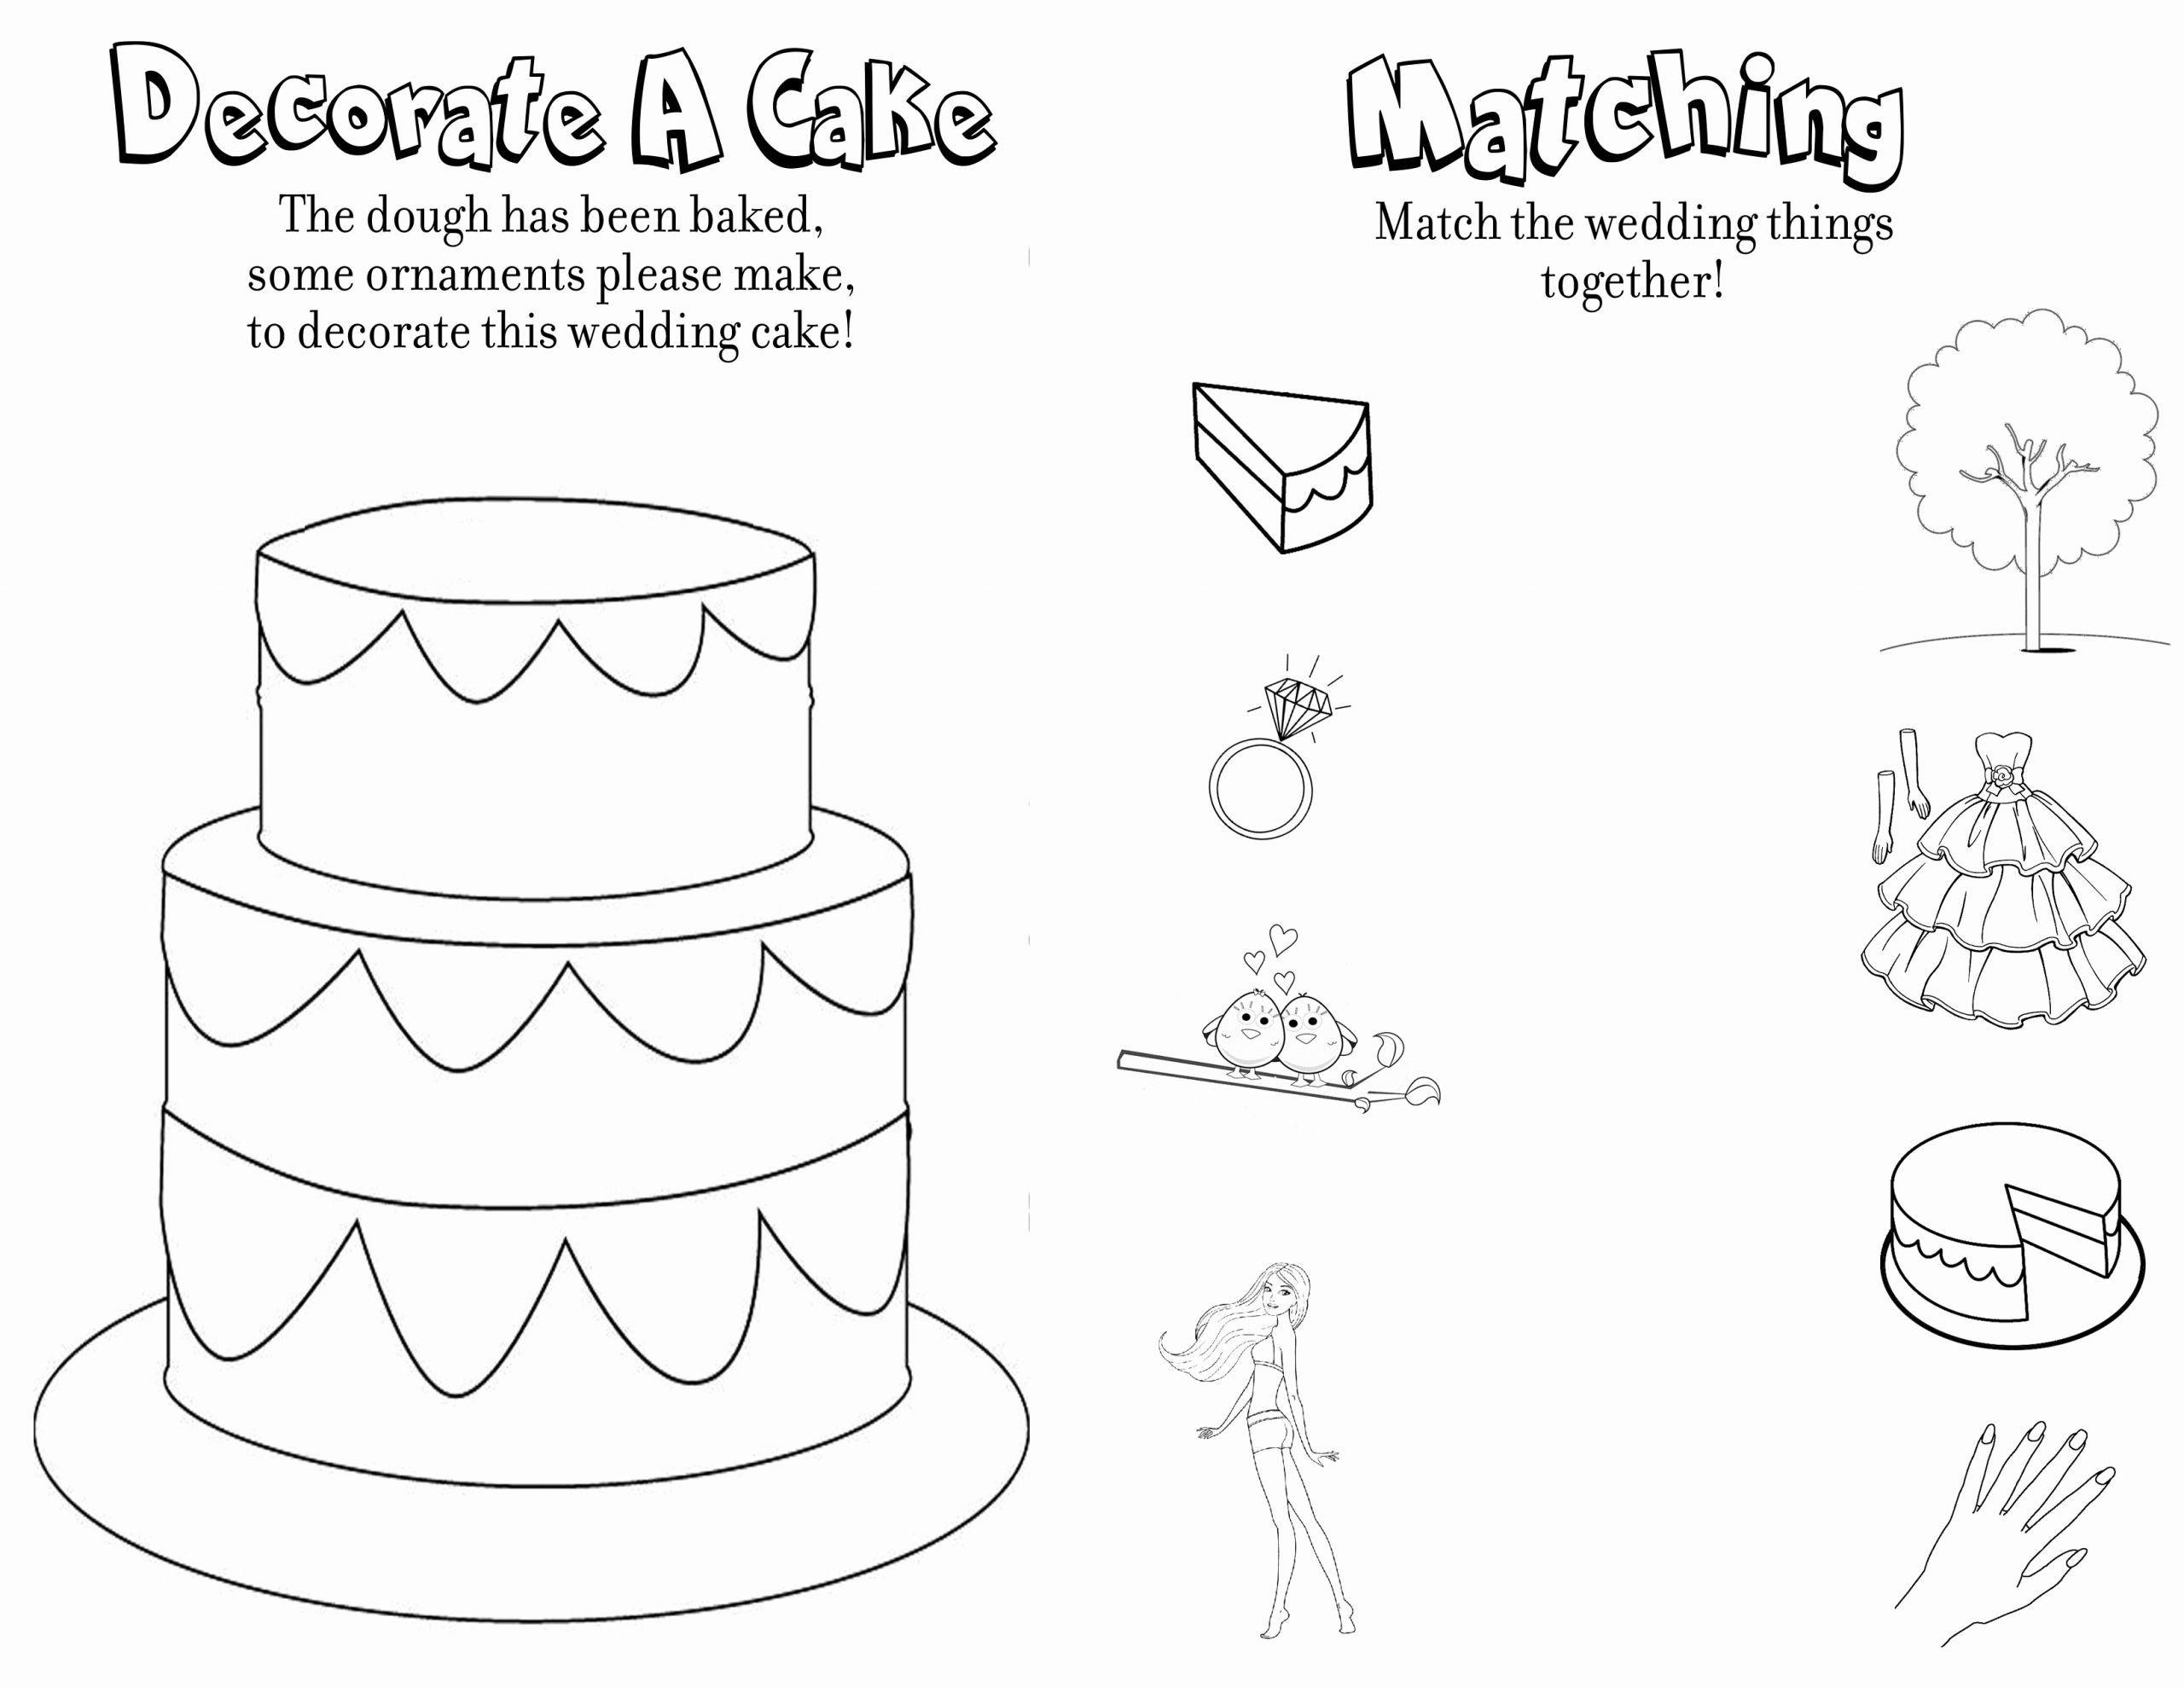 Wedding Activity Coloring Pages Elegant Wedding Themed Coloring And Activity Book Wedding Coloring Pages Personalized Coloring Book Wedding With Kids